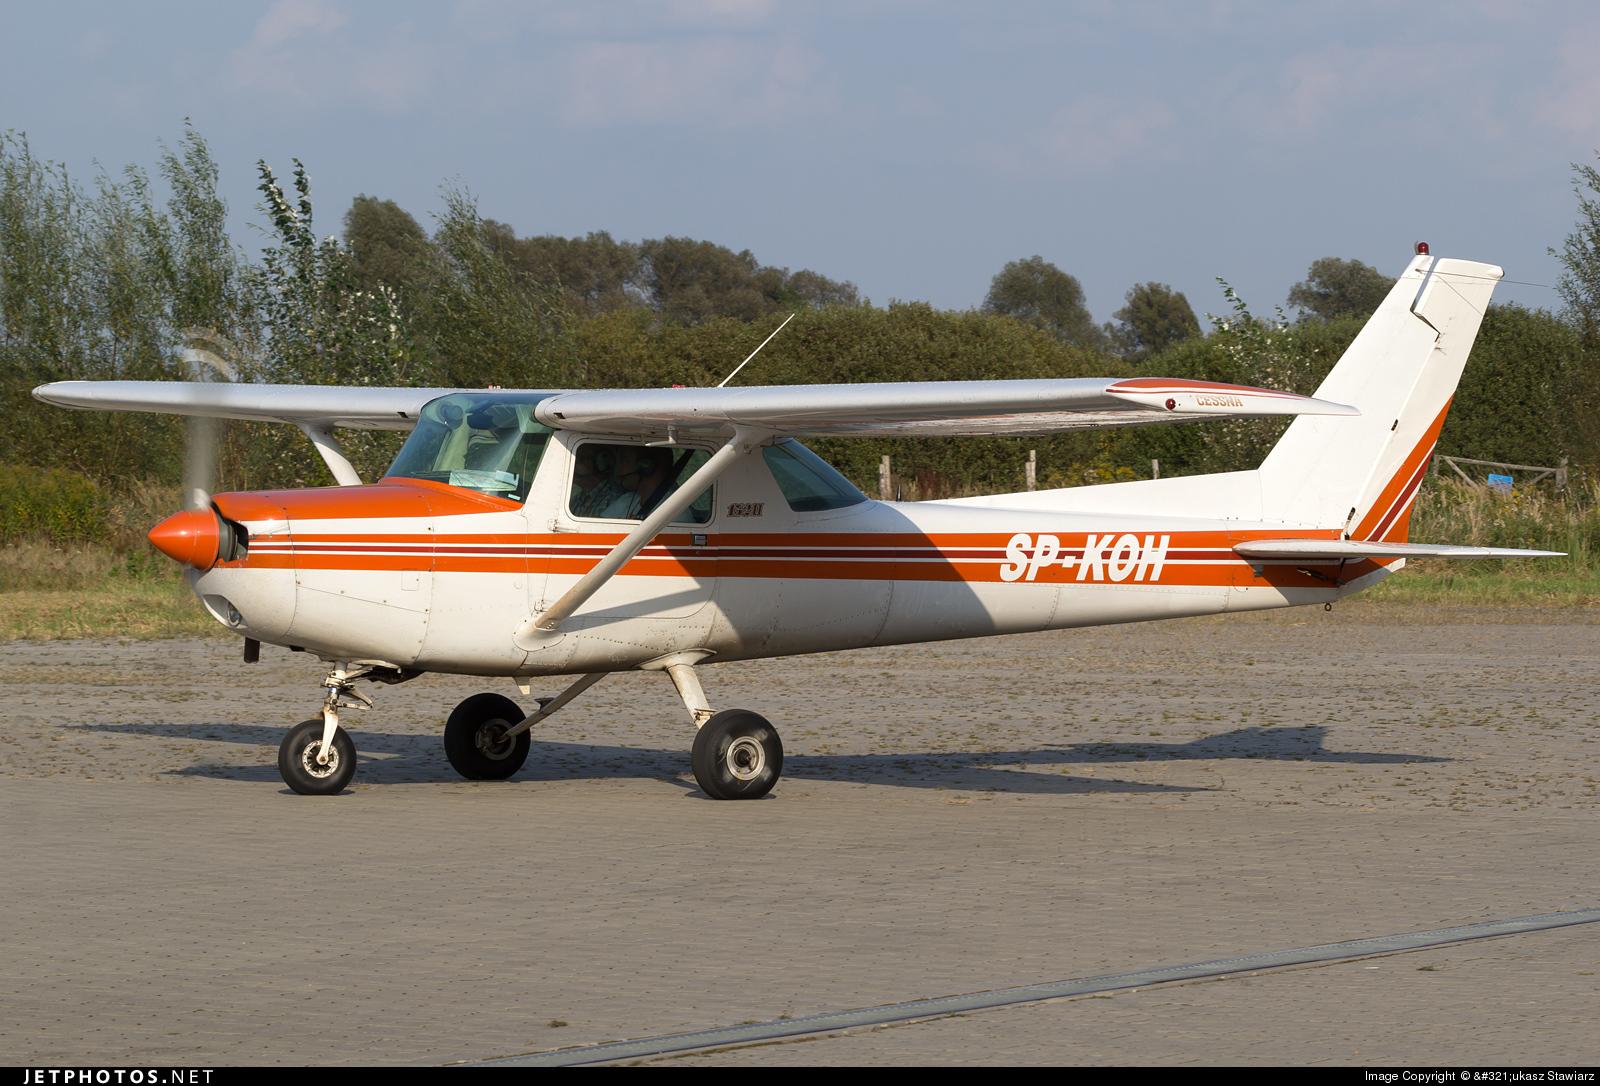 SP-KOH - Cessna 152 - Aero Club - Bialostocki